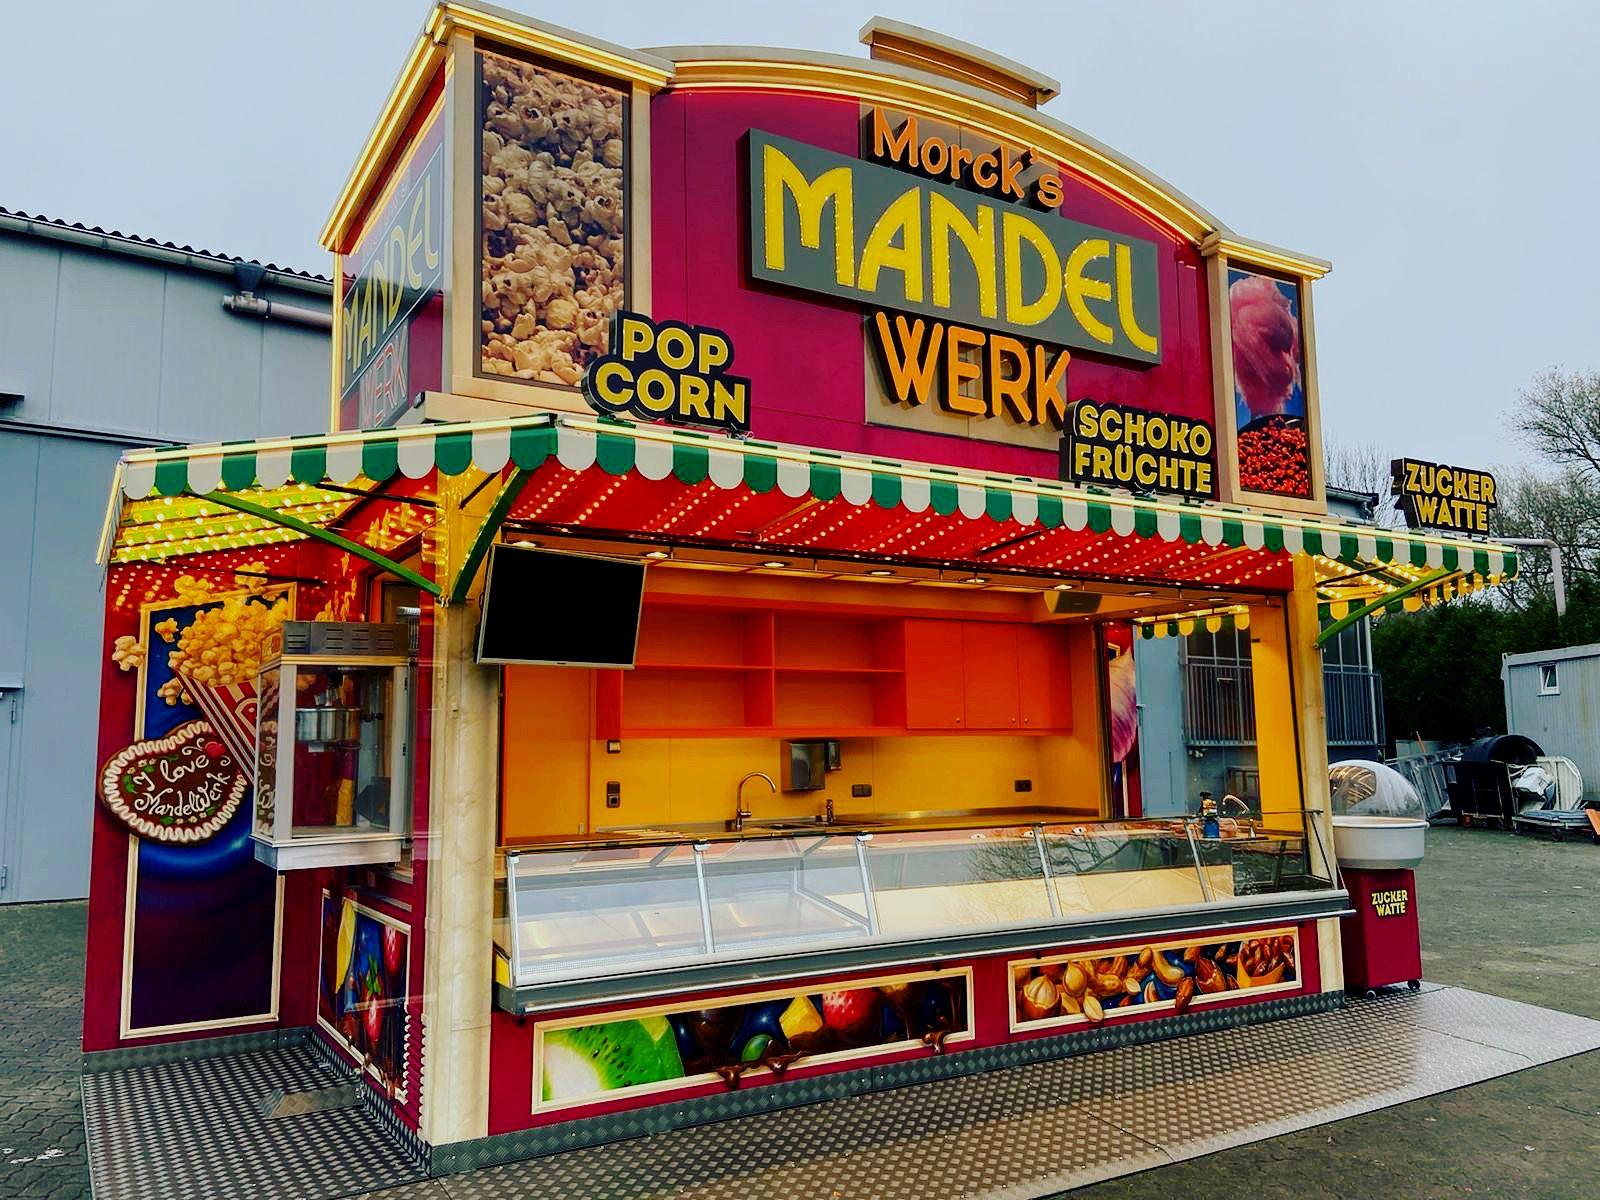 Morck´s Mandel Werk